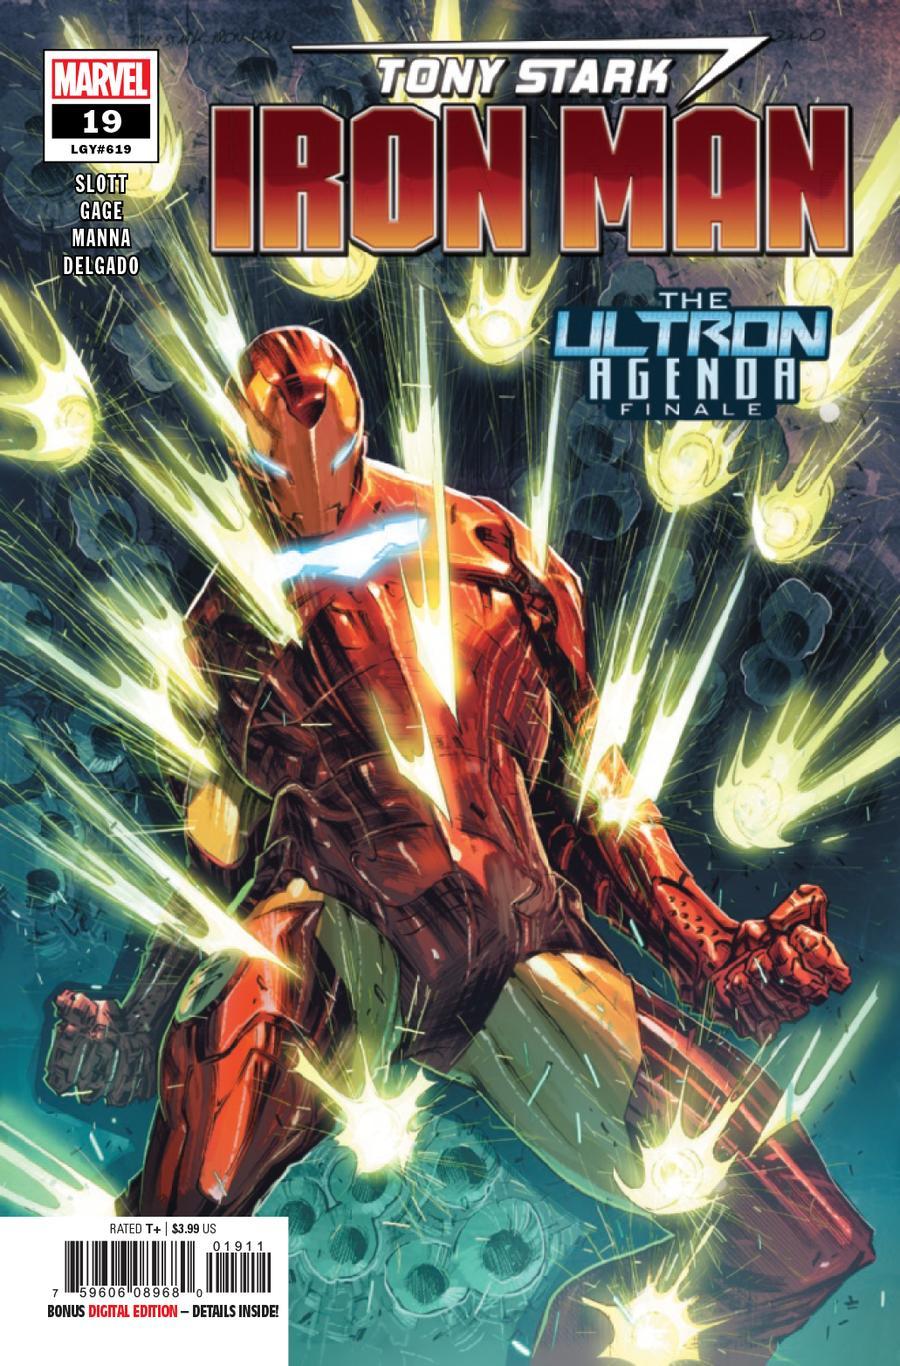 Tony Stark Iron Man #19 Cover A 1st Ptg Regular Alexander Lozano Cover